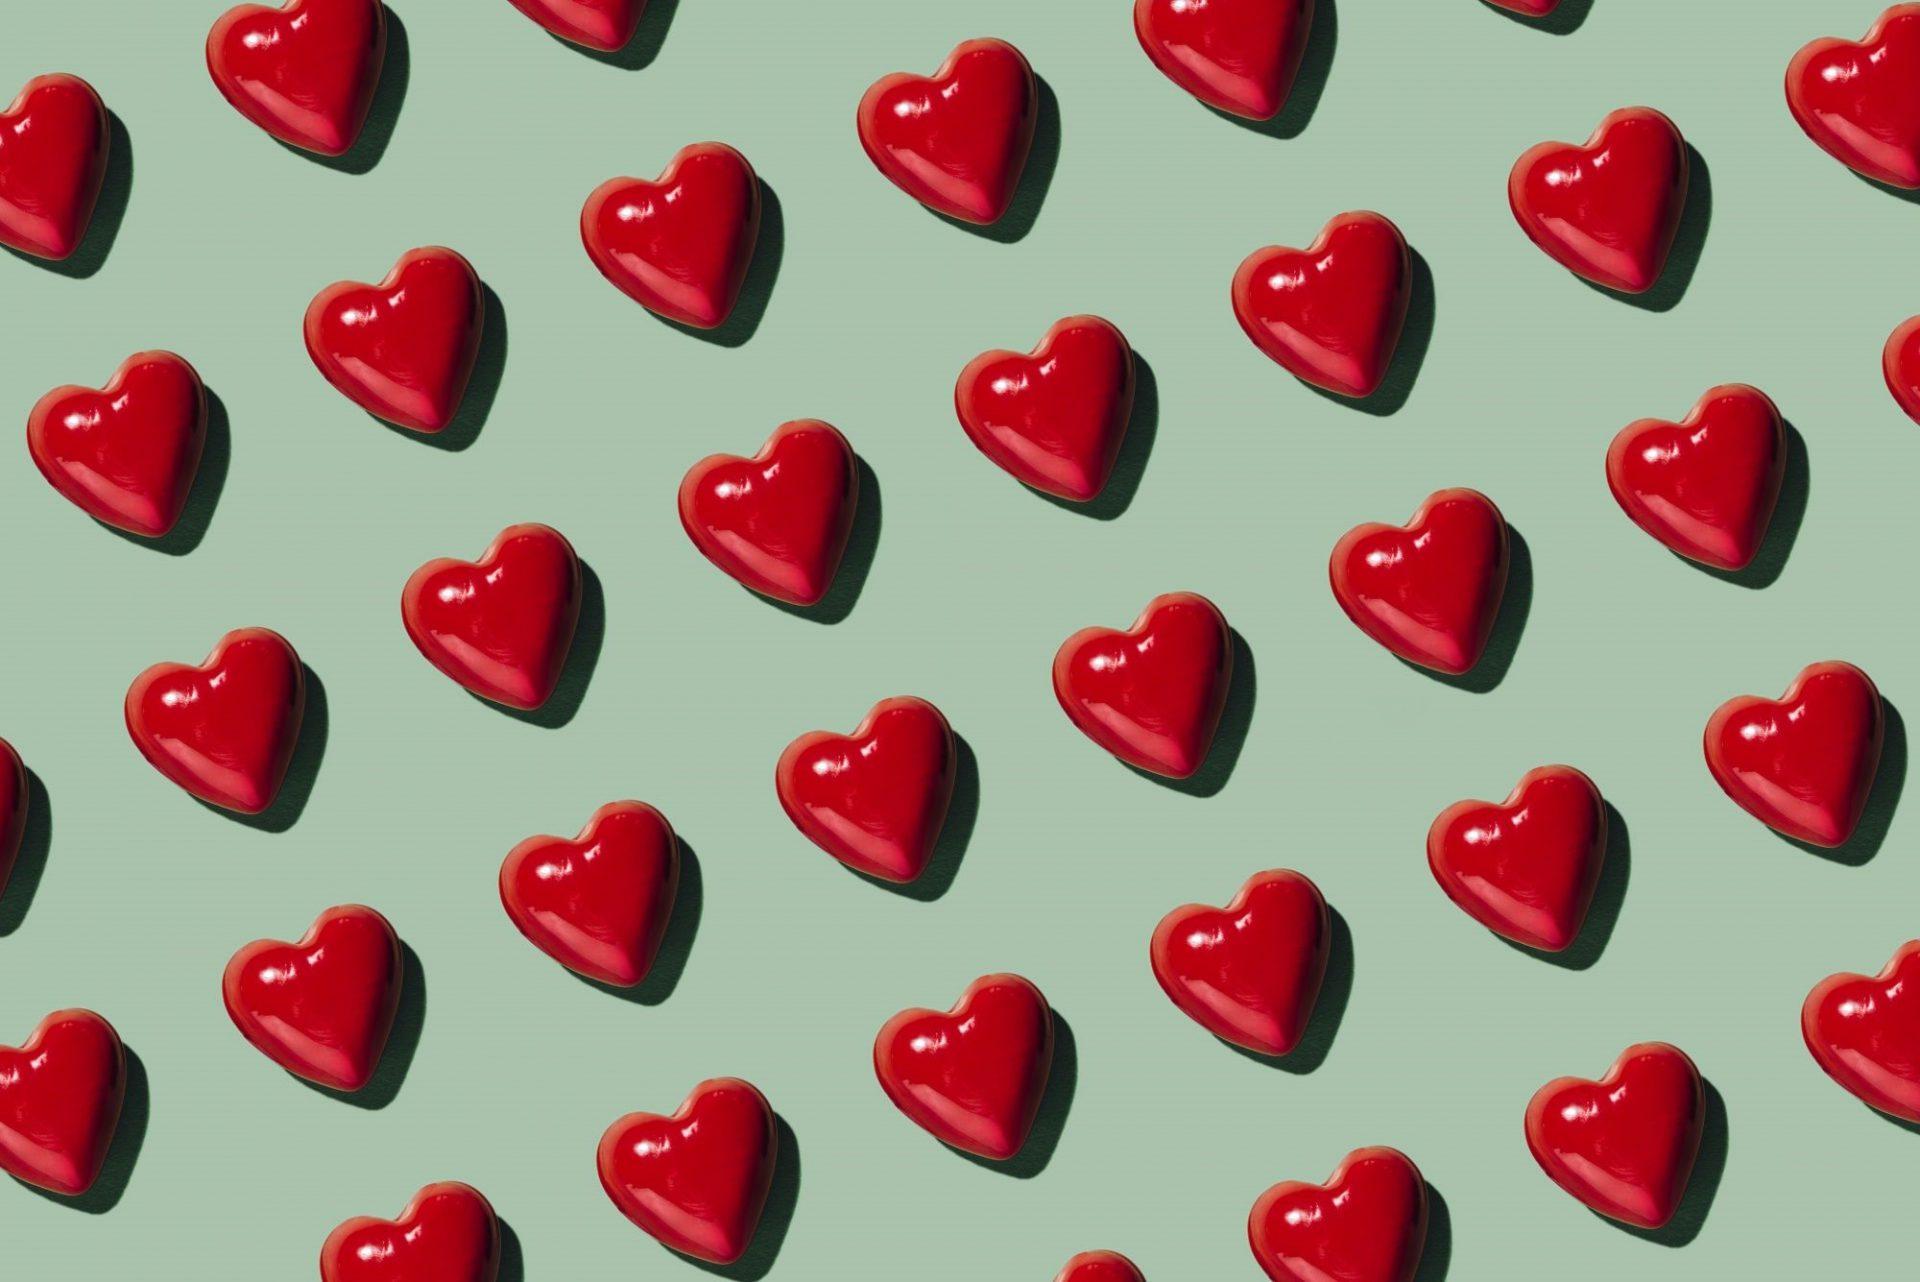 Valentine marketing ideas to keep in mind this season